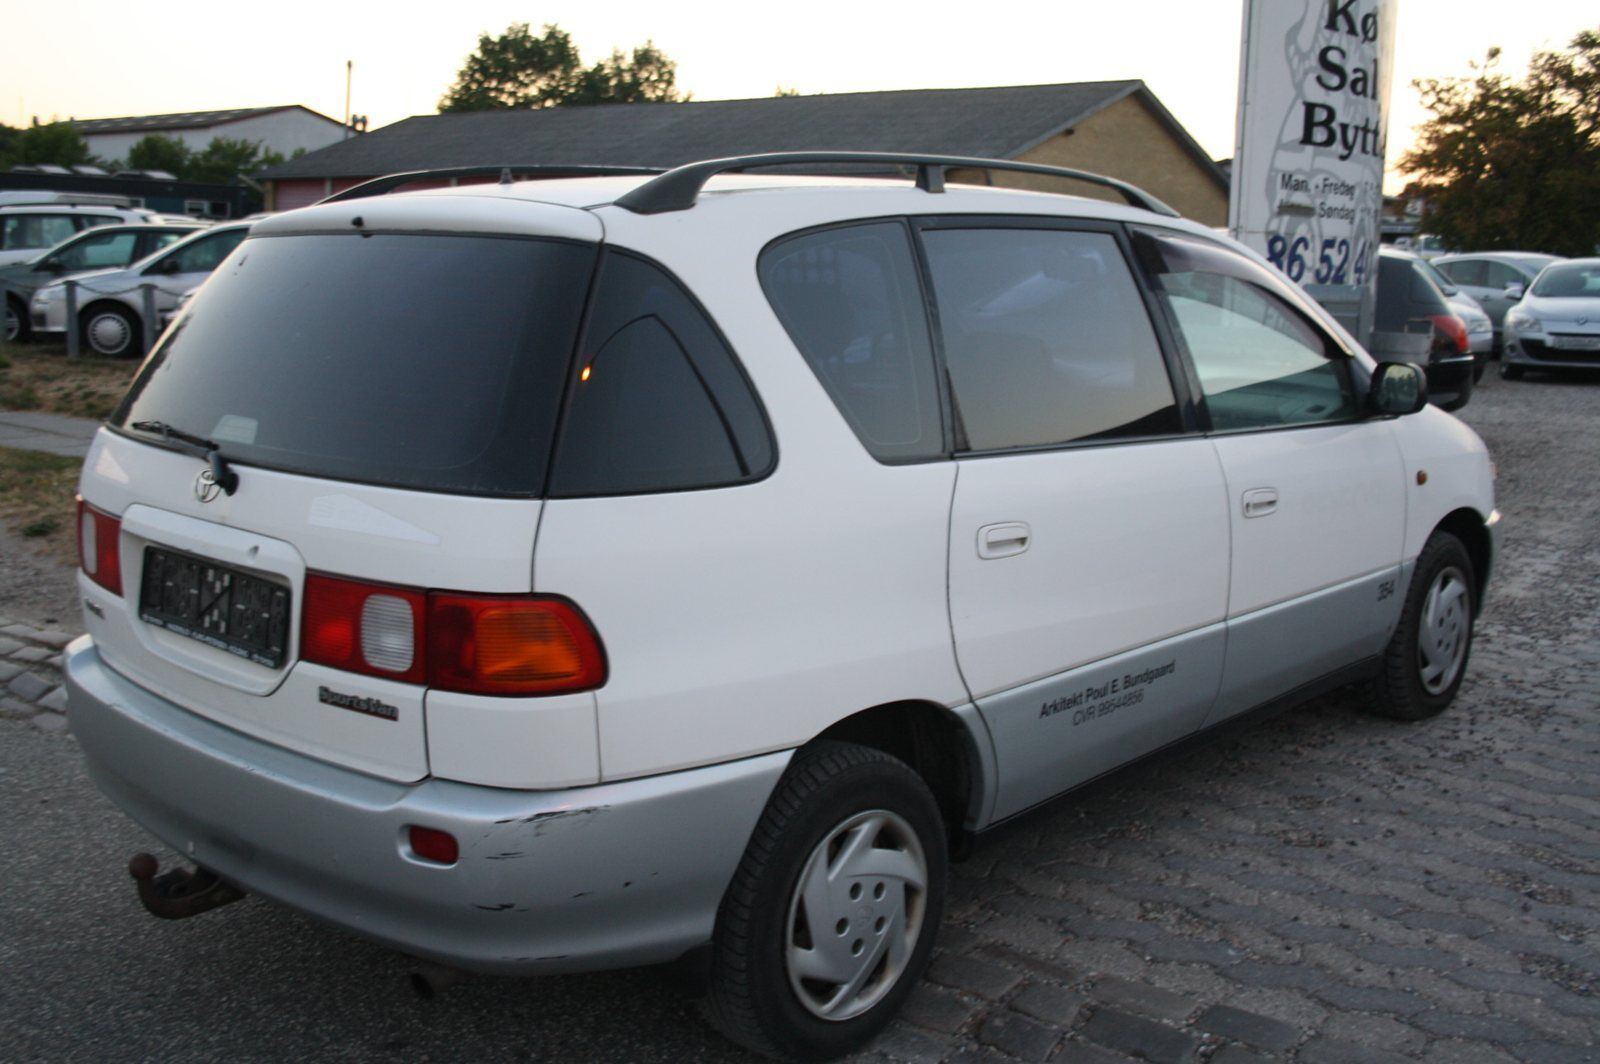 14d903682dd151 Brugt Toyota Sportsvan 2,0 B til salg - Bilbasen